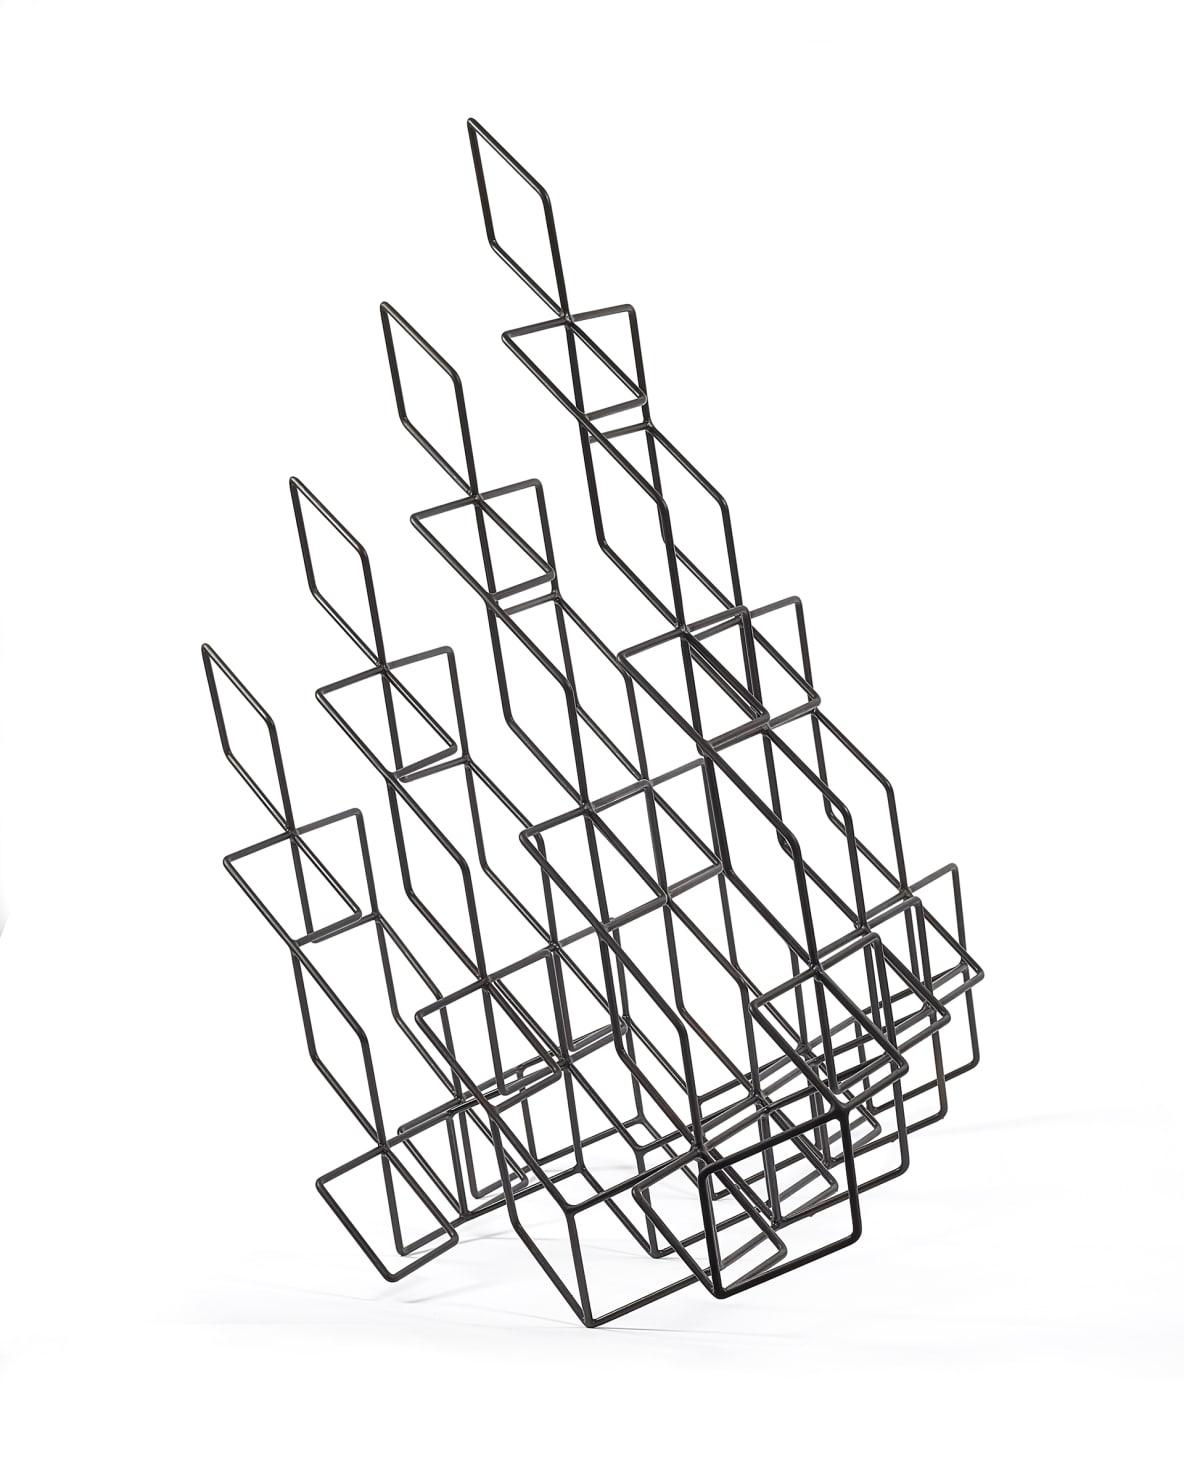 Will Nash, Black Prism, 2017